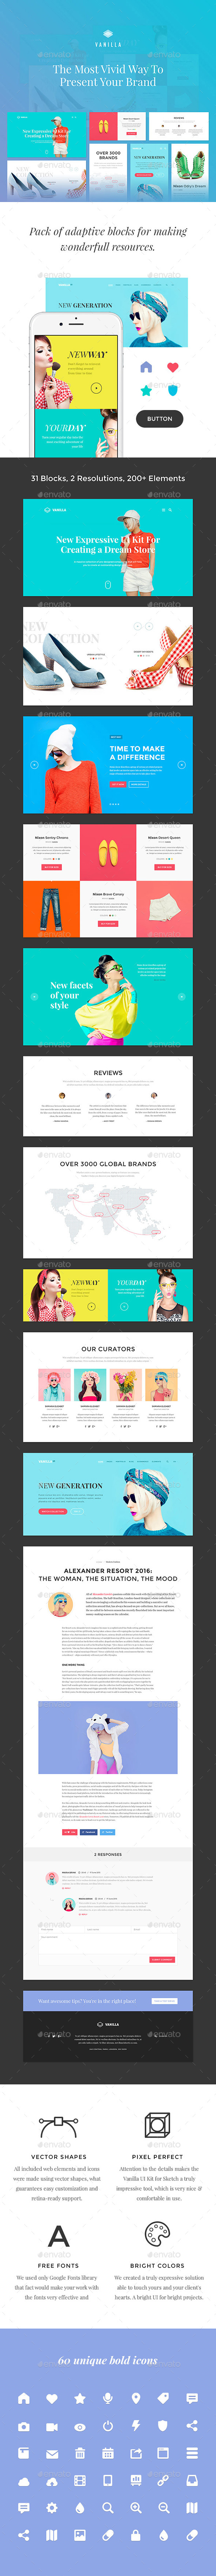 Vanilla UI Kit for Photoshop (User Interfaces)